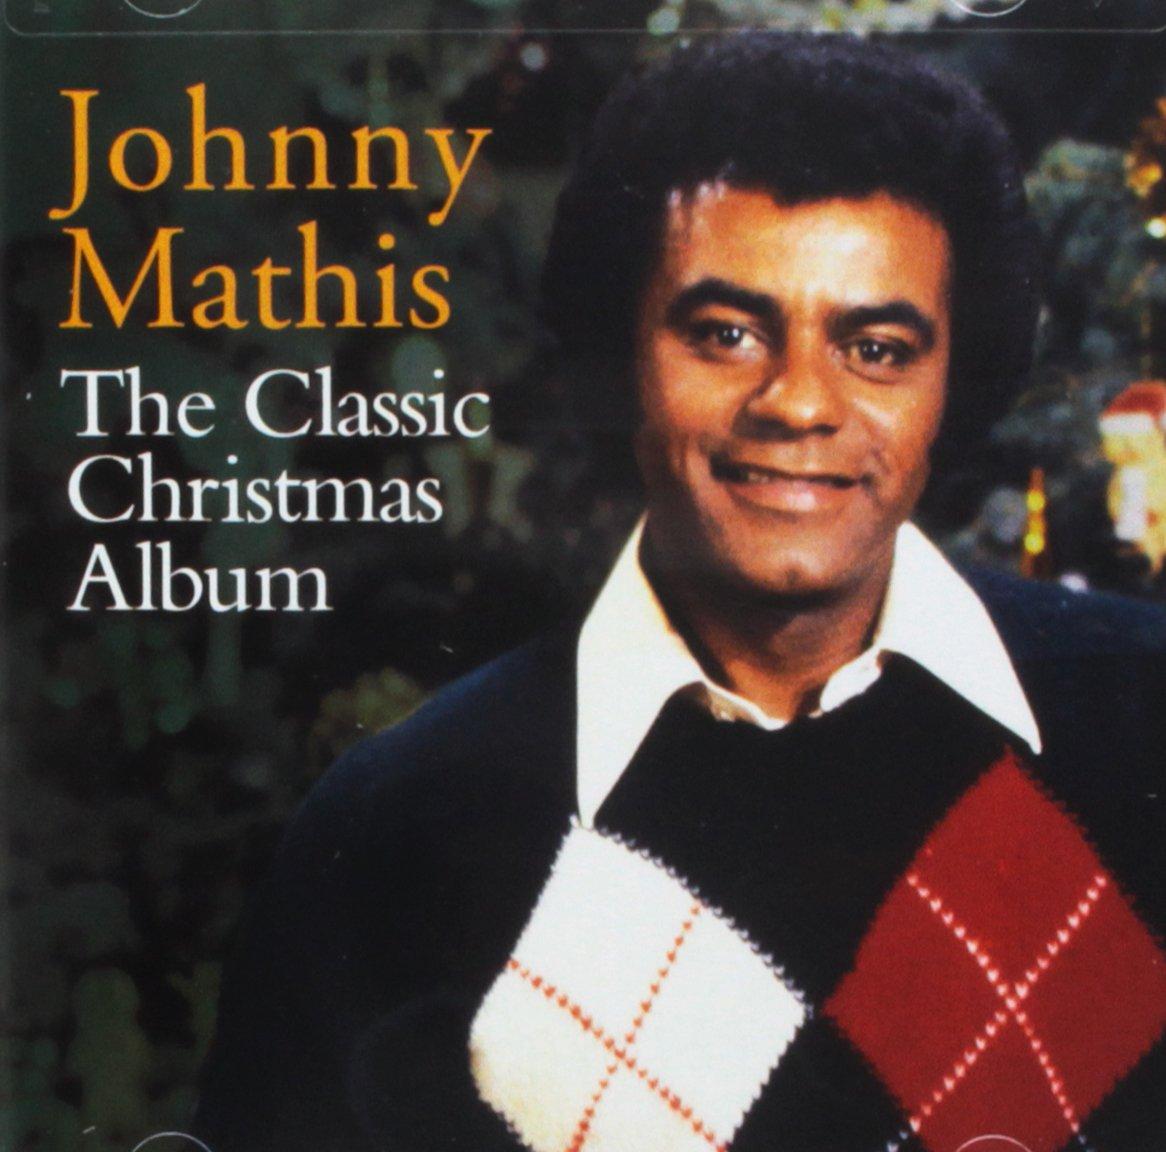 Johnny Mathis - The Classic Christmas Album - Amazon.com Music